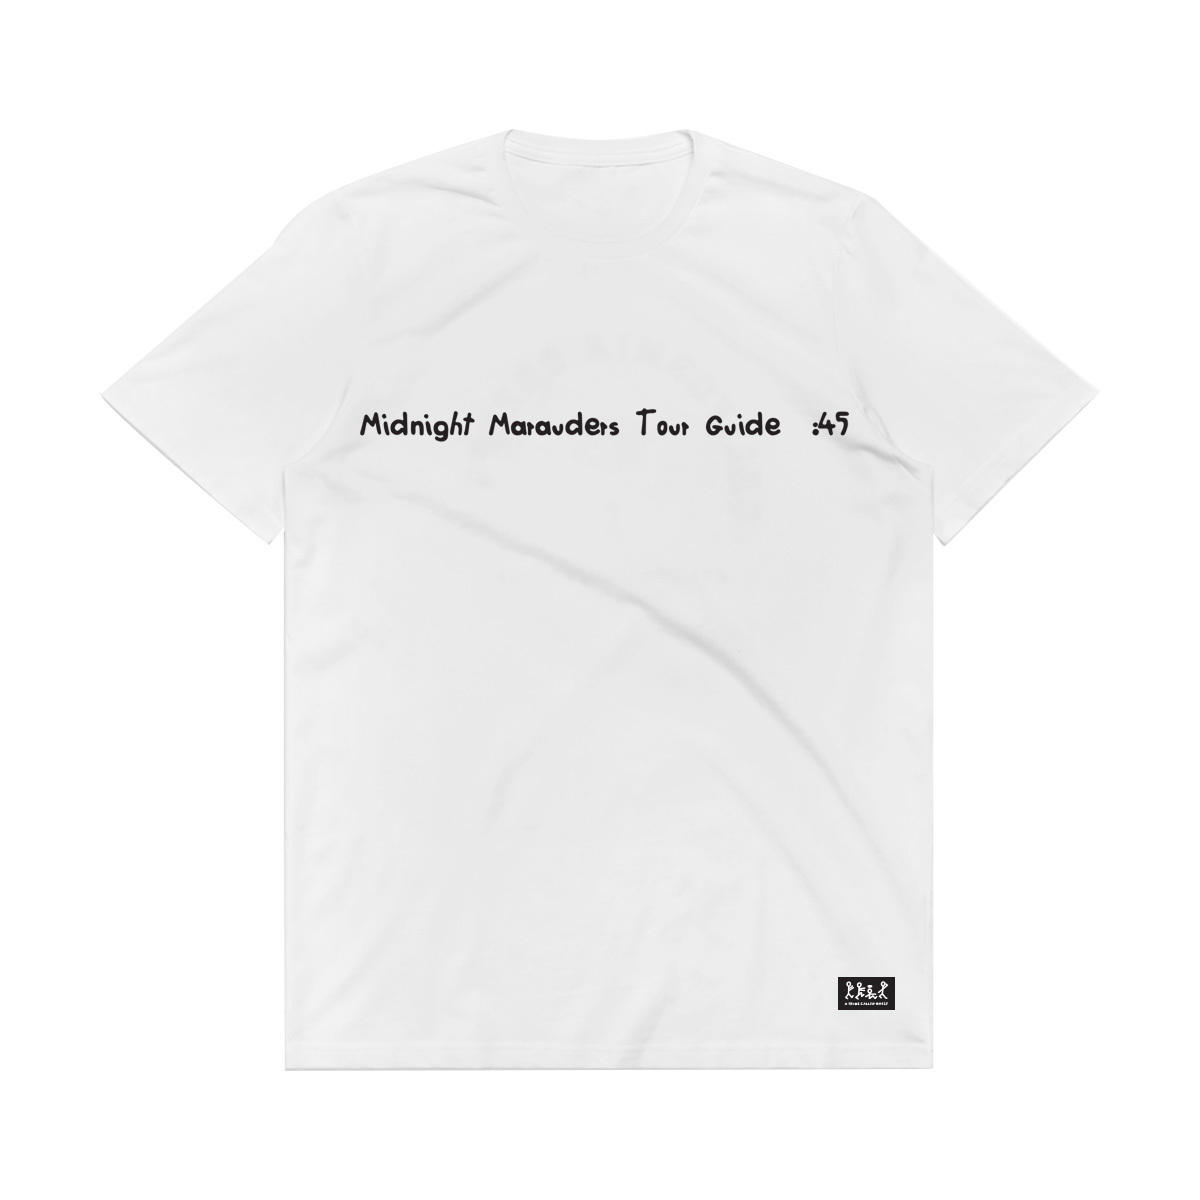 Midnight Marauders Tour Guide T-shirt